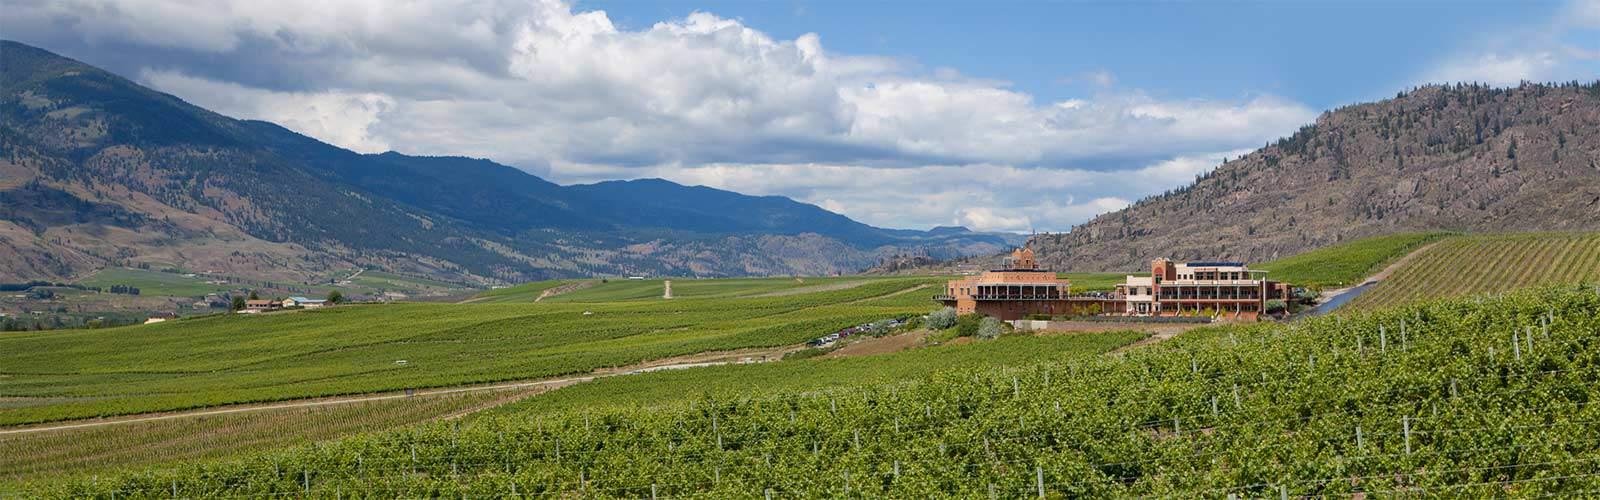 Oliver Wine Region Of British Columbia Wine Bc